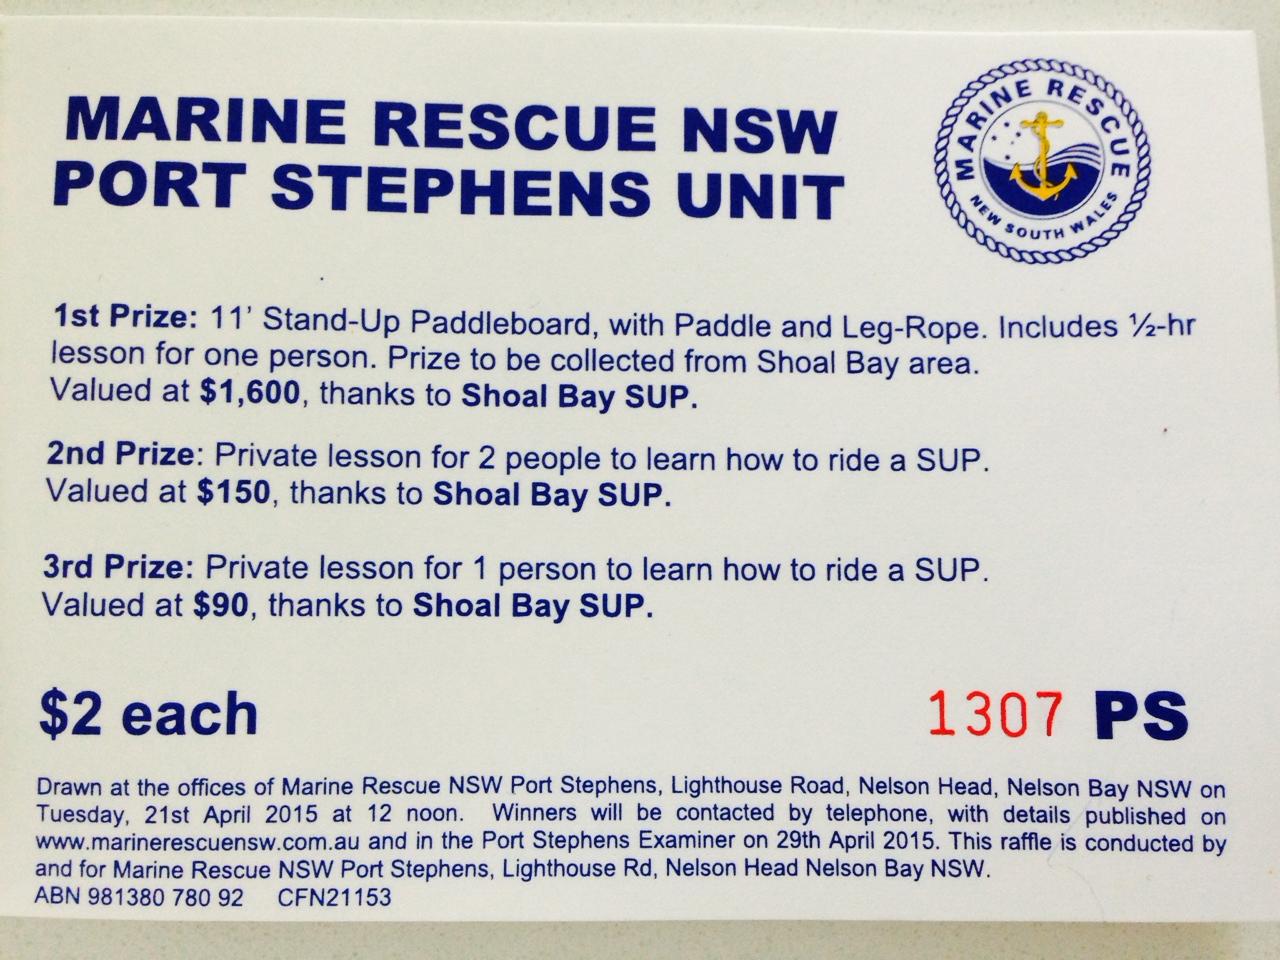 Marine rescue raffle